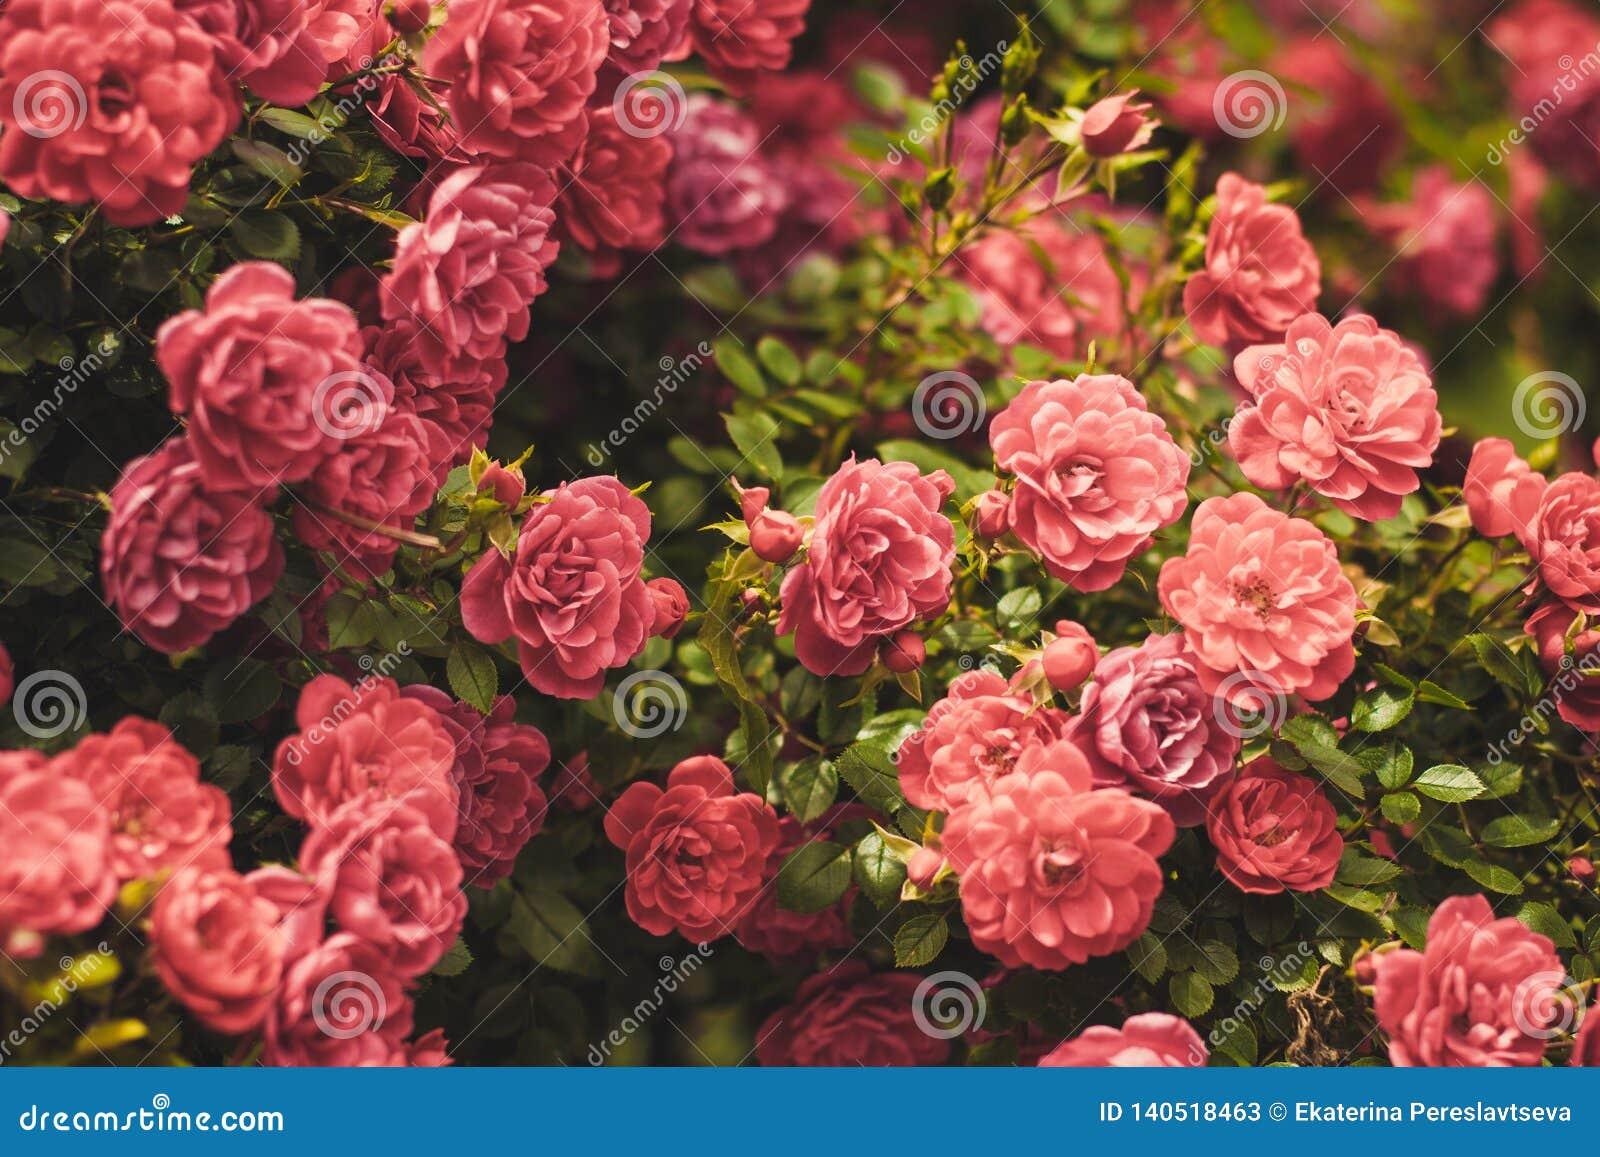 Roze Rose Bushes Blooming Garden Summer